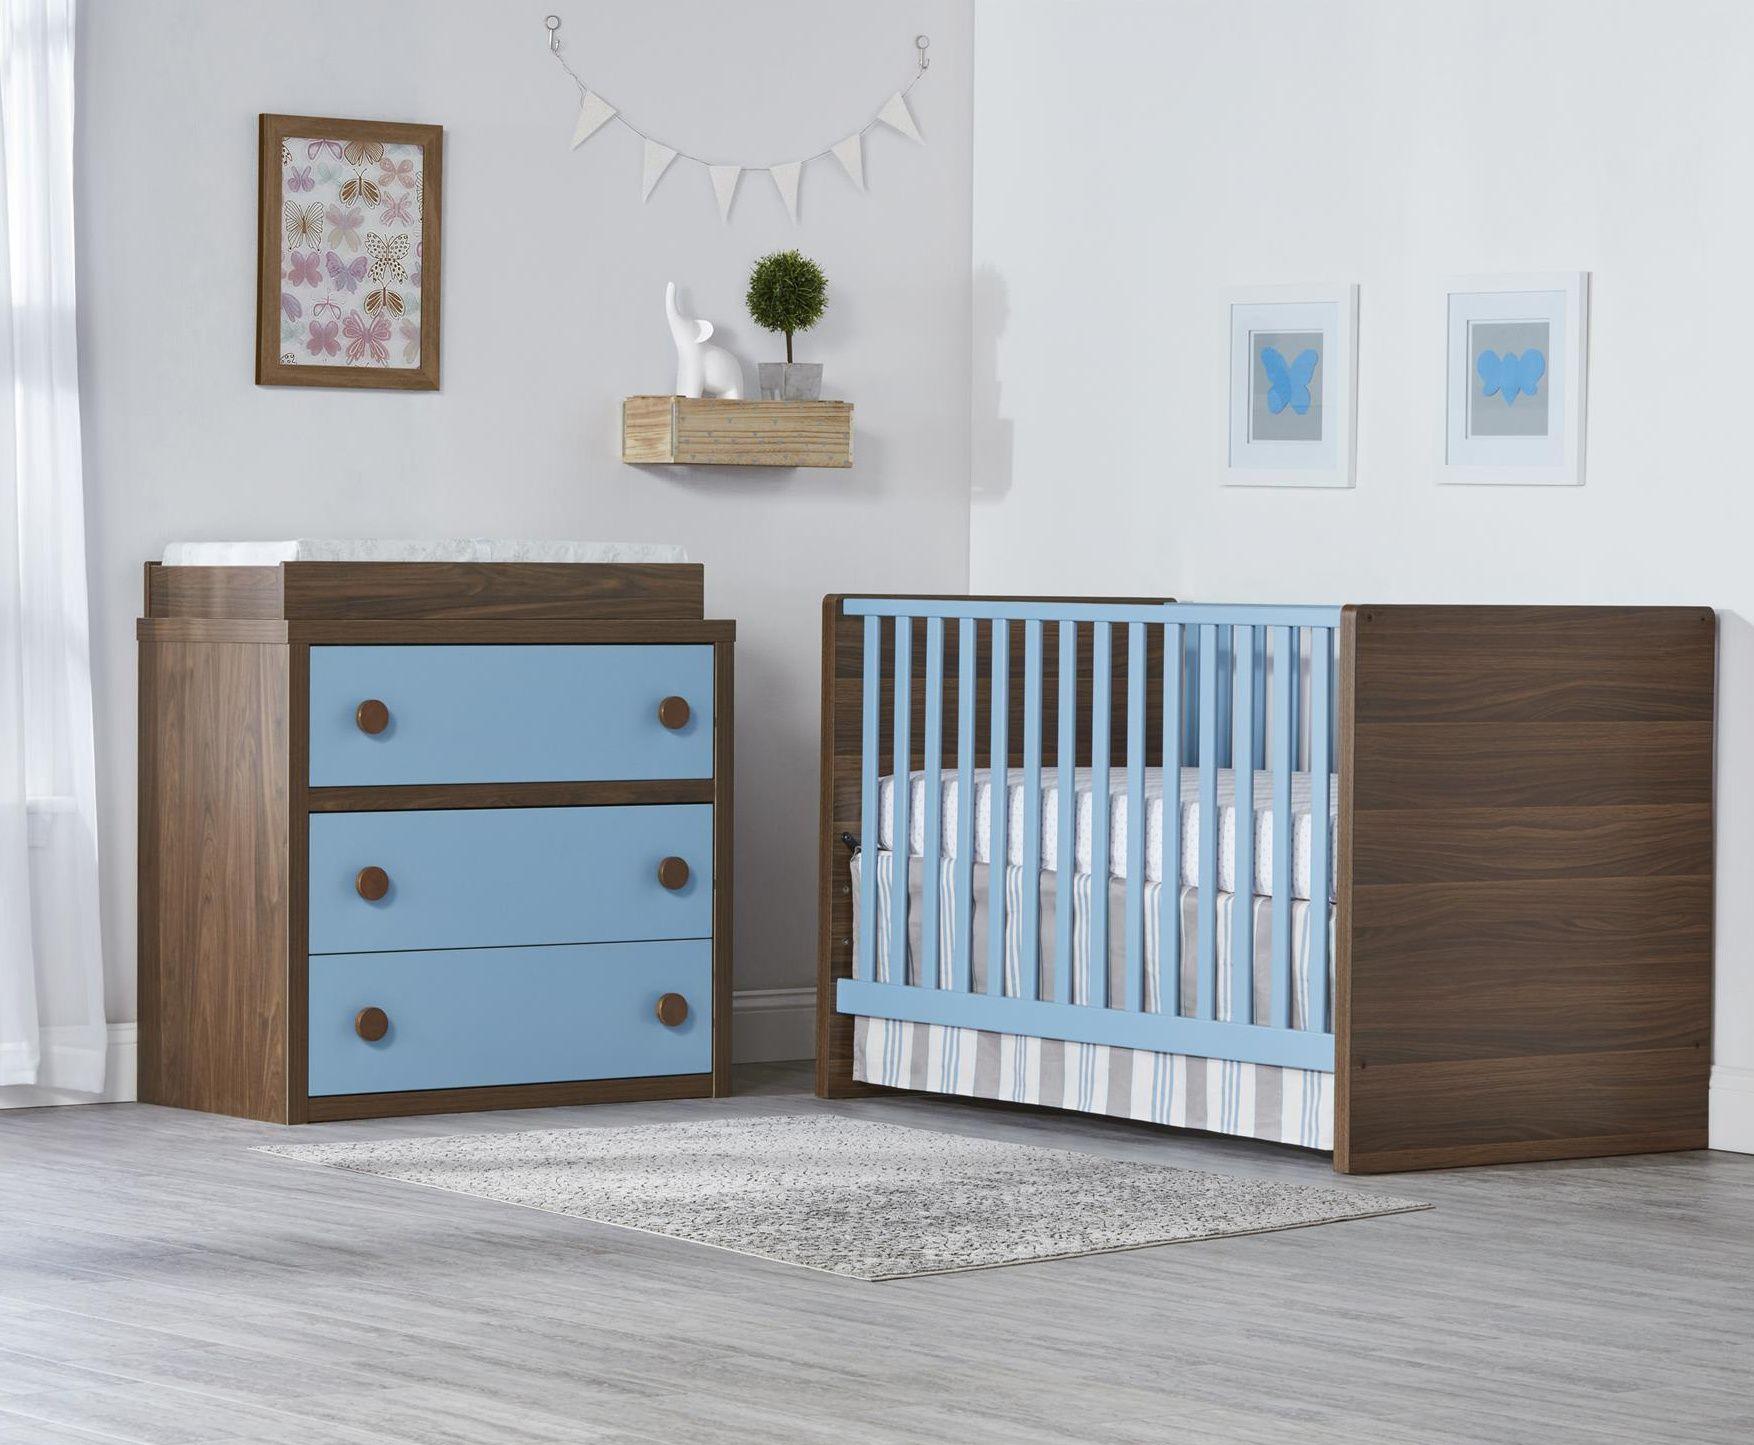 Choose the sierra ridge nursery collection for a modern